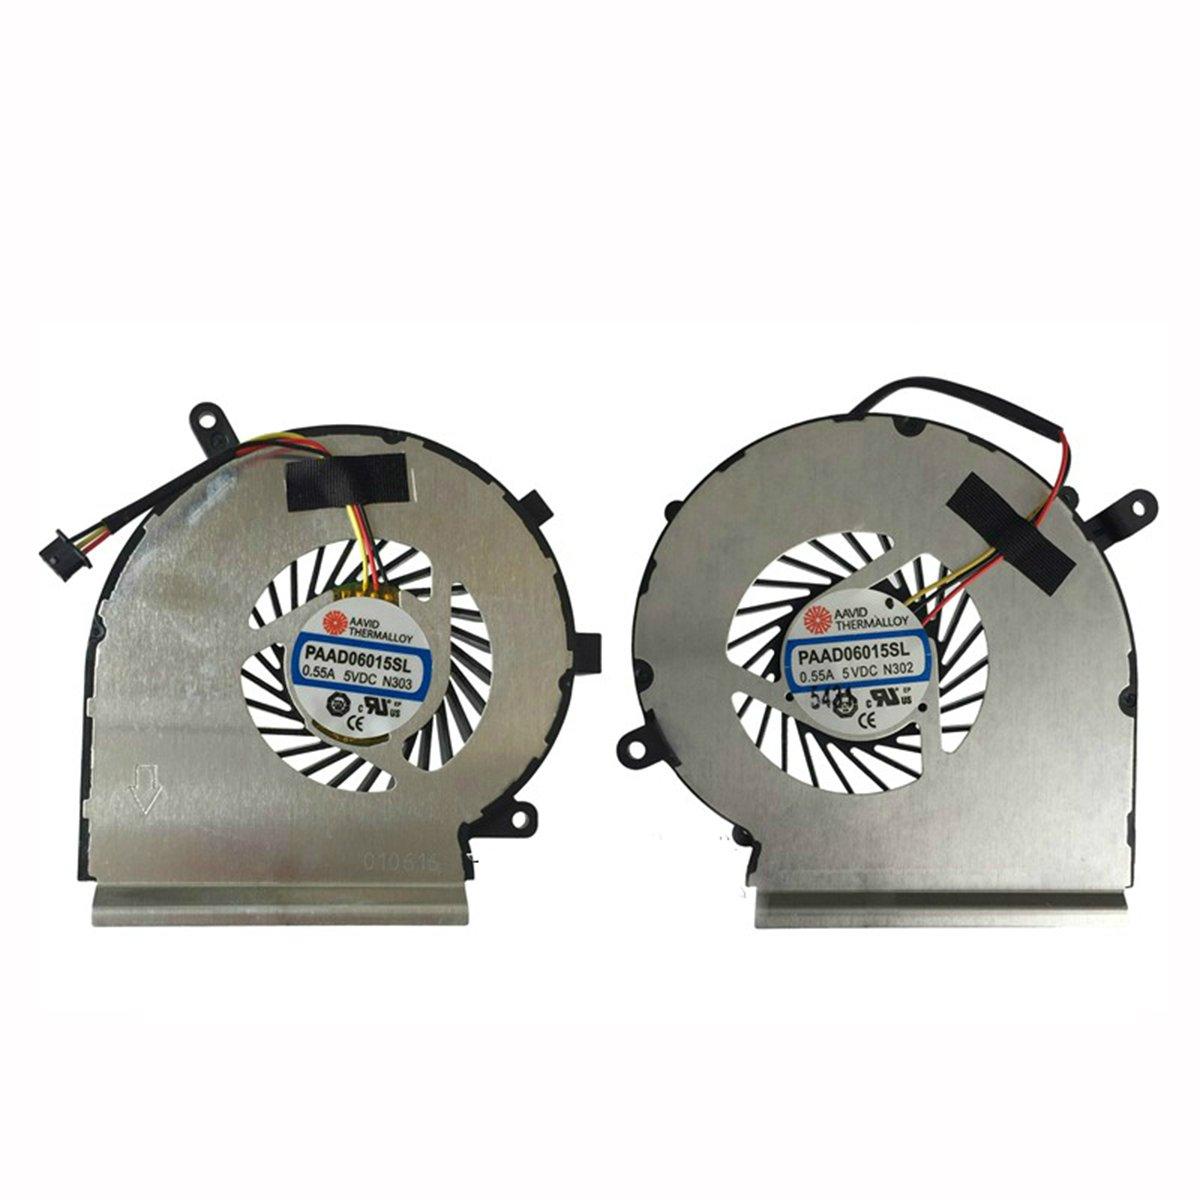 Cpu Cooling Fan + Gpu Cooling For Msi Ge72 Ge62 Pe60 Pe70 Gl62 Gl72, 2 Fans PAAD06015SL N302 N303 by sywpart (Image #1)